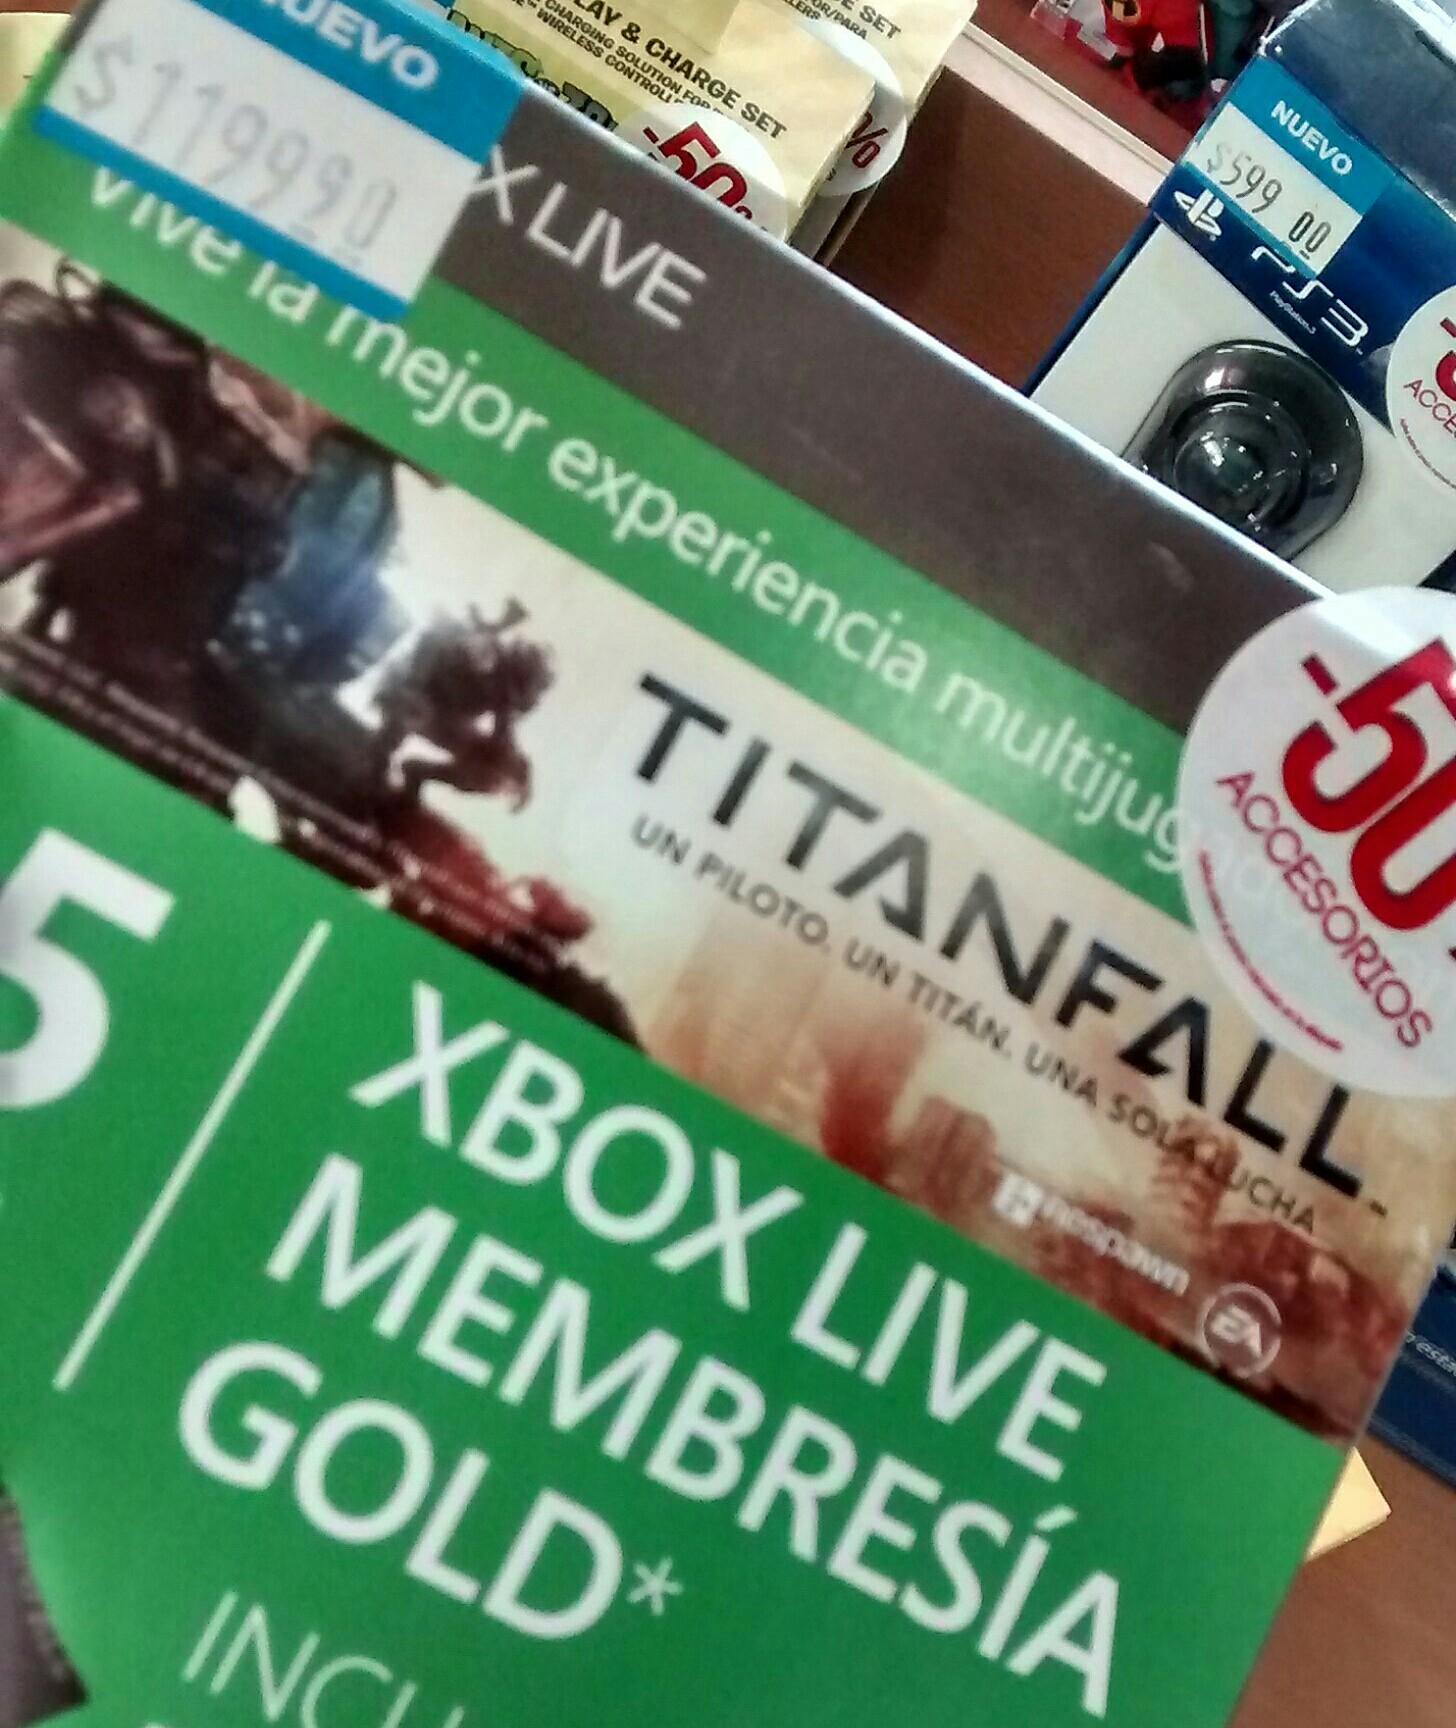 Blockbuster: 25 meses de Xbox live Gold + Playera titanfall+ skins $600 y Wii Speak $99